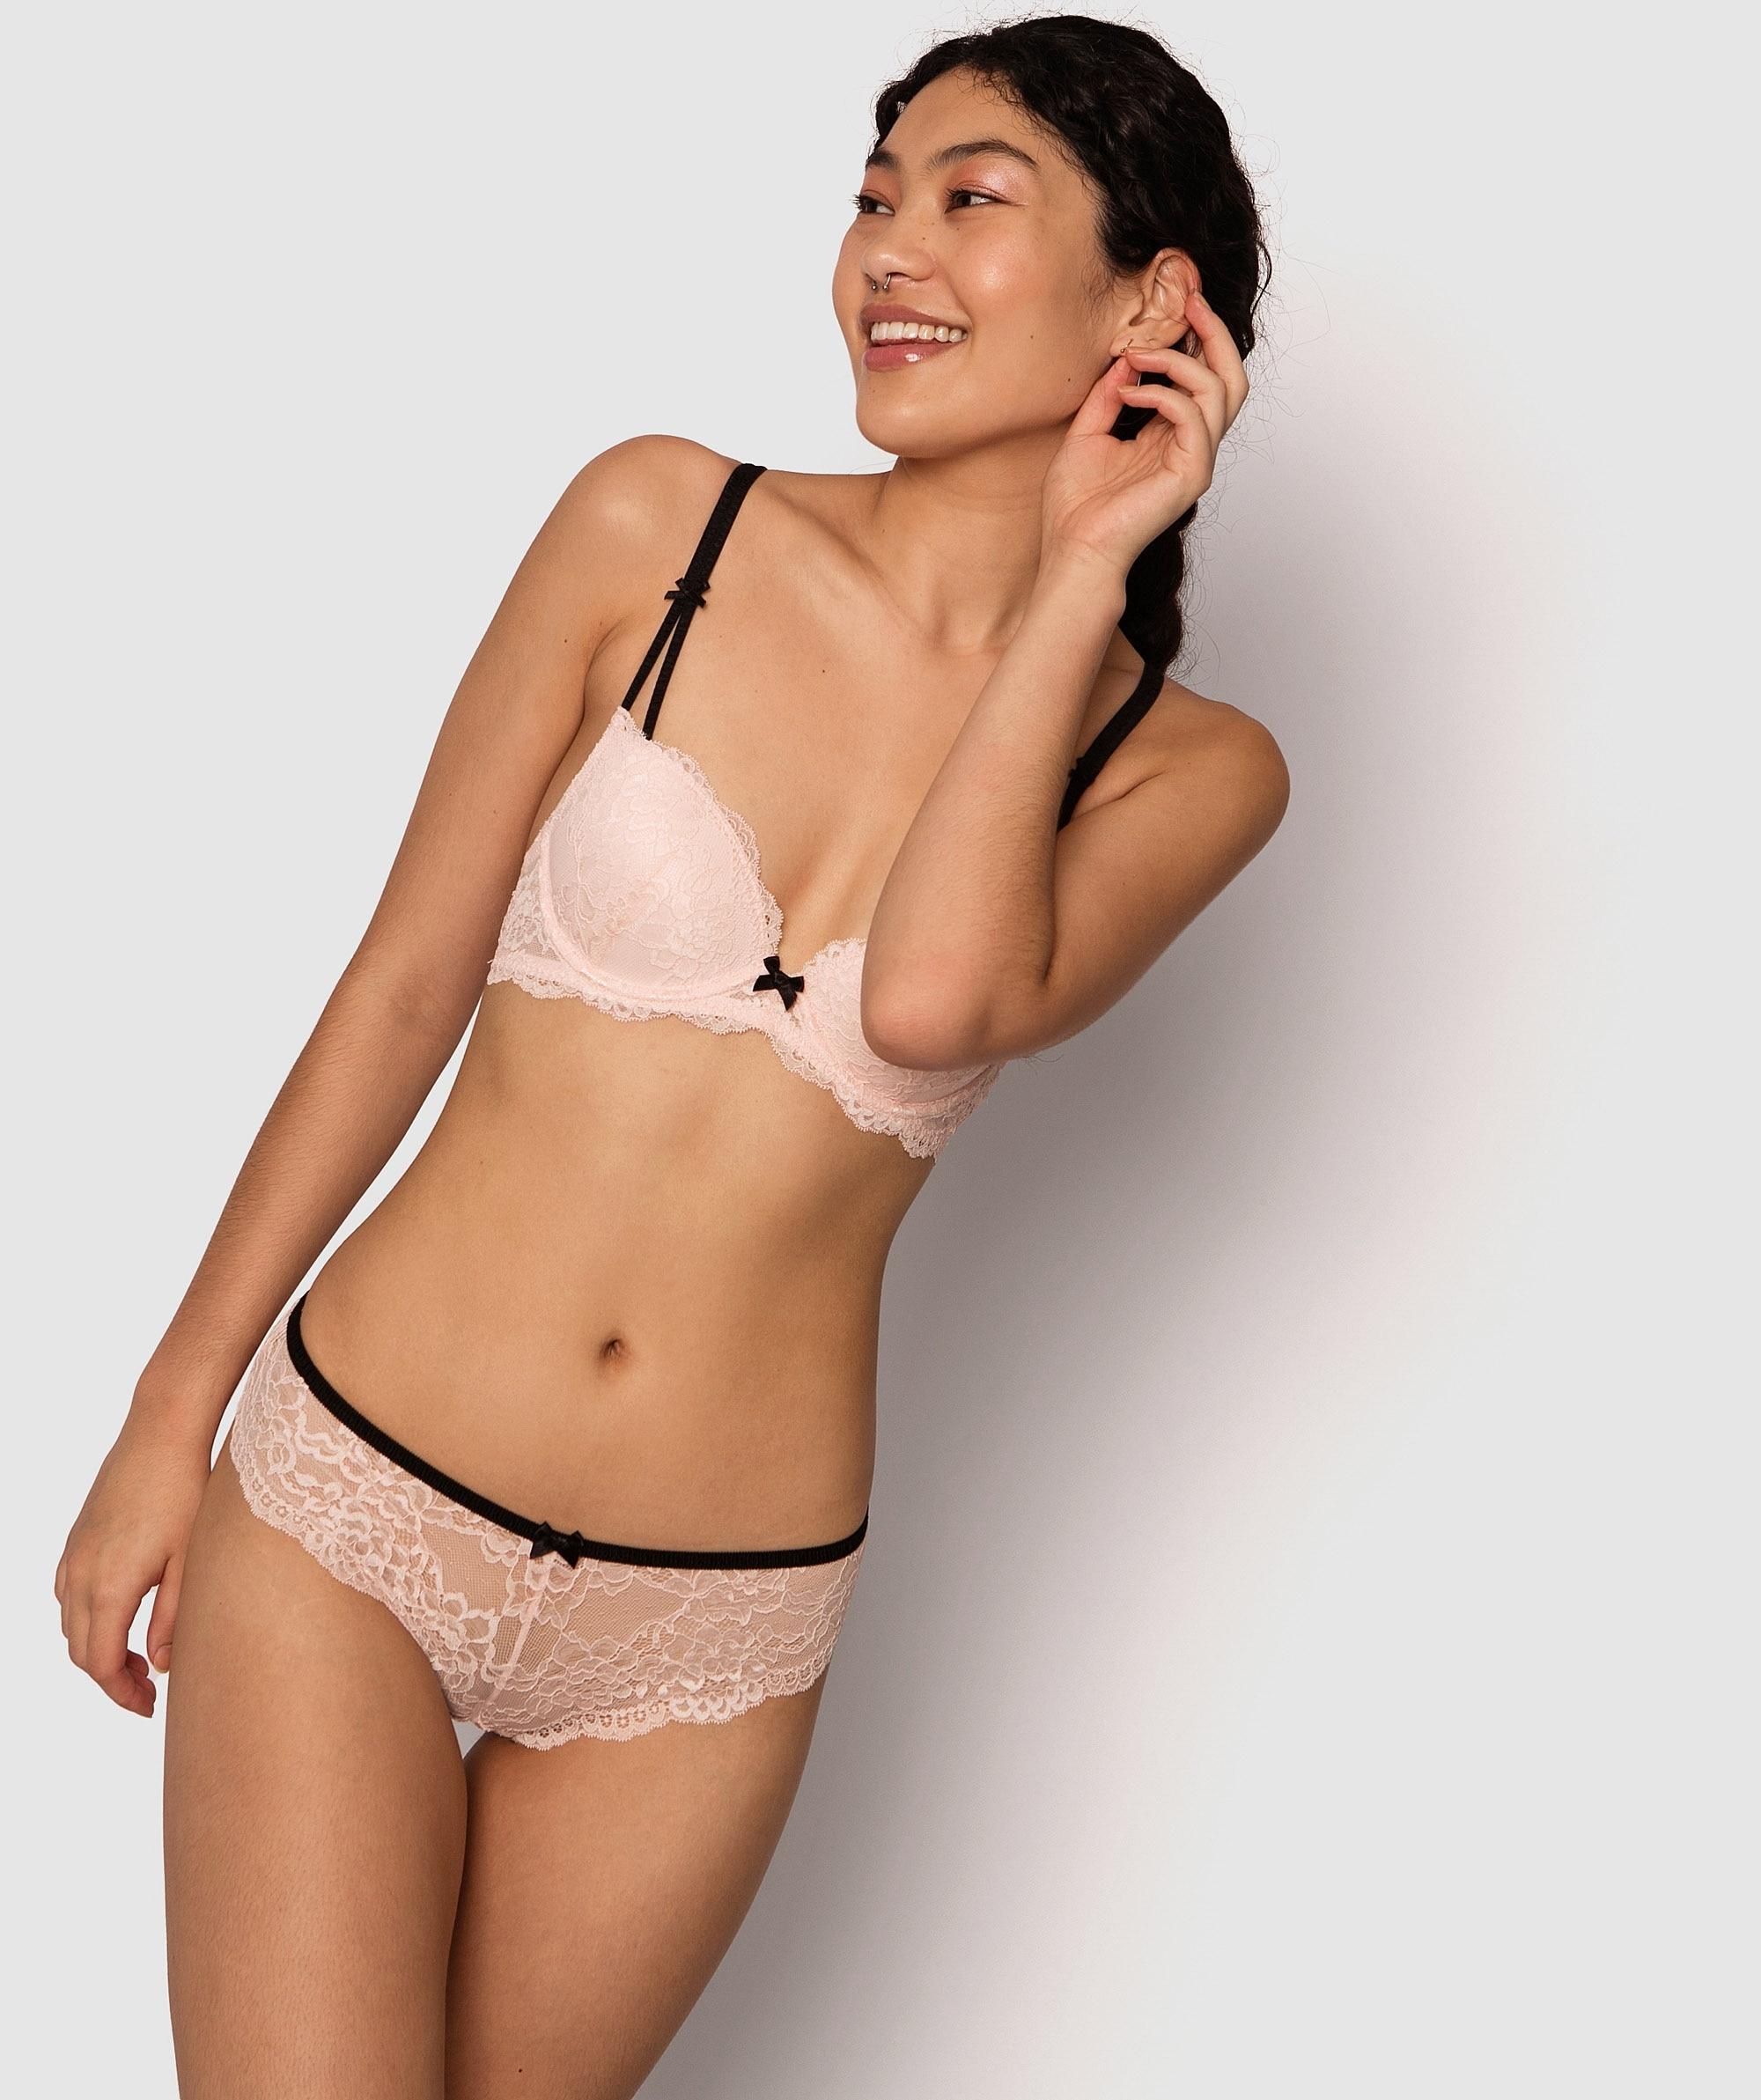 Paloma Push Up Bra - Light Pink/Black